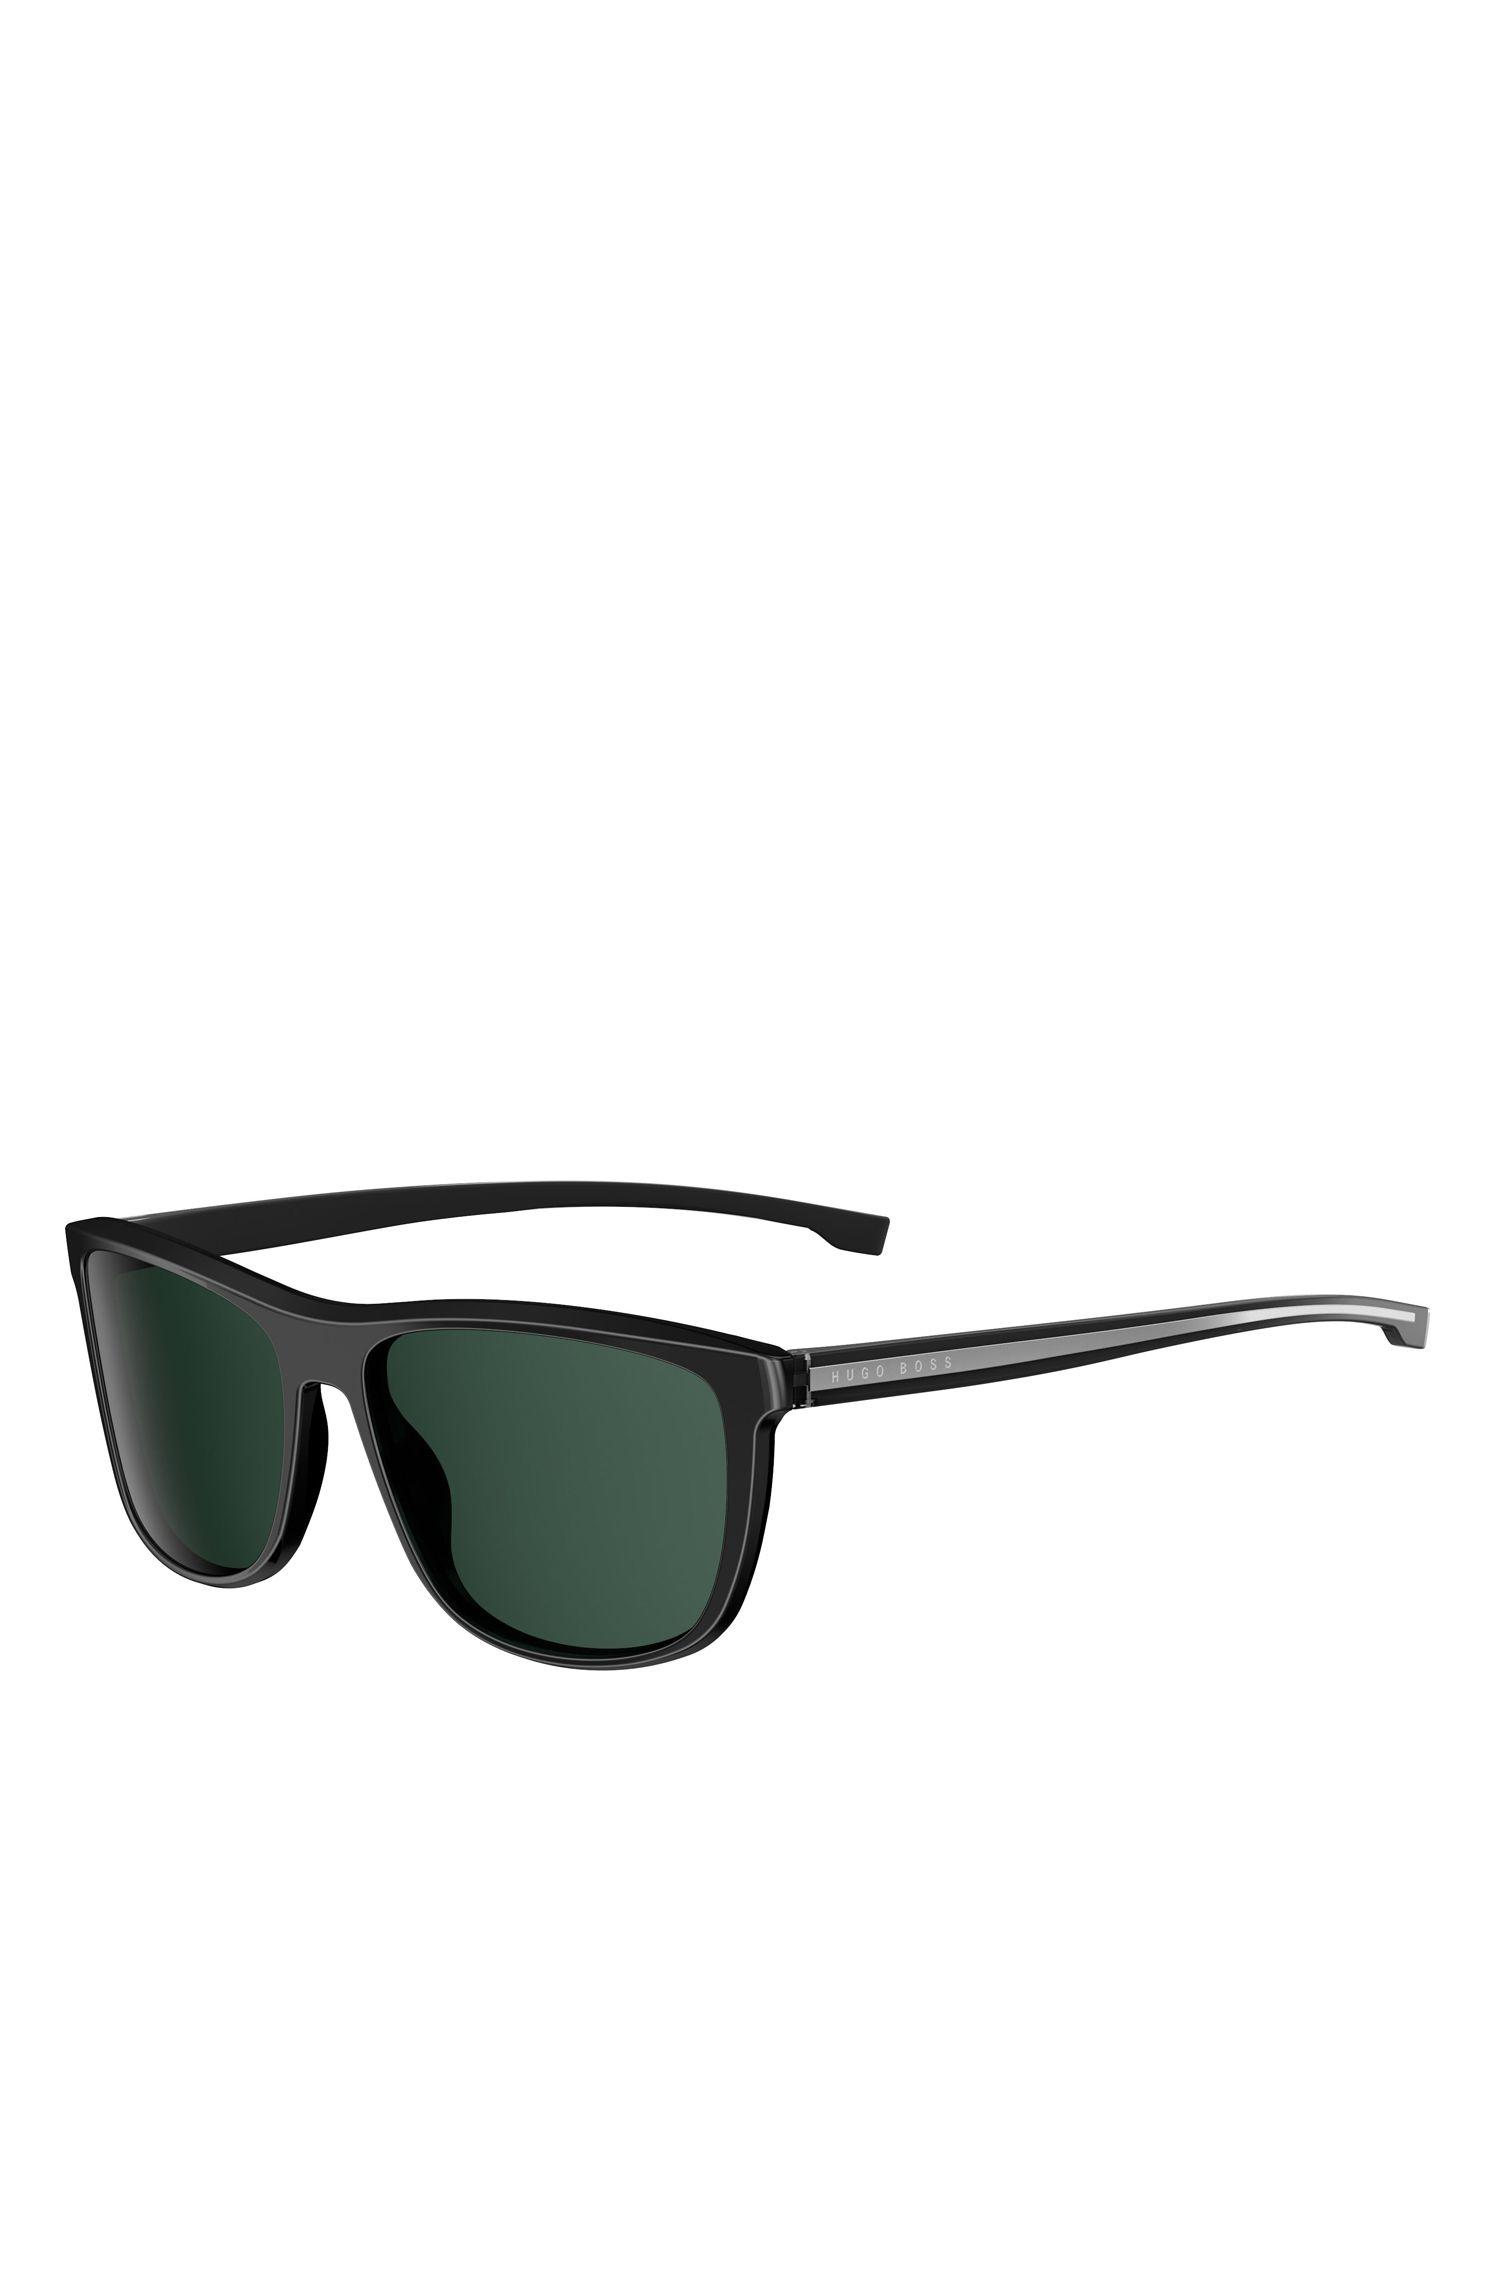 Black Lens Top Bar Sunglasses | BOSS 0874S, Assorted-Pre-Pack